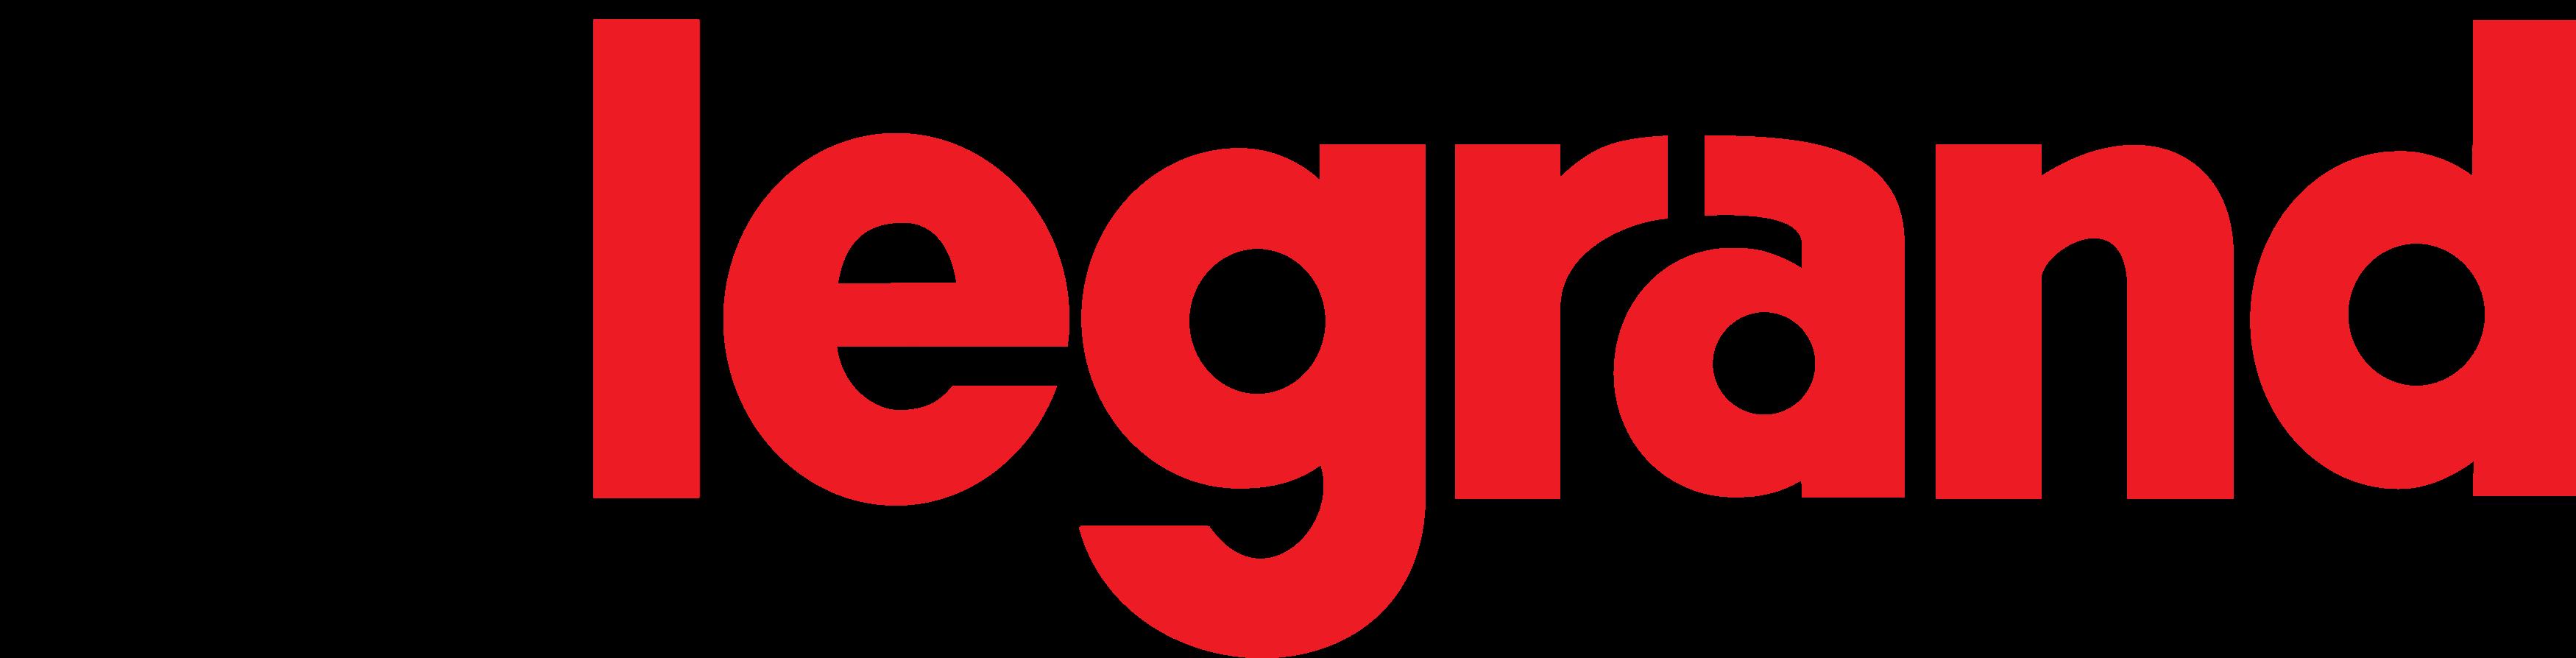 legrand logo - Legrand Logo